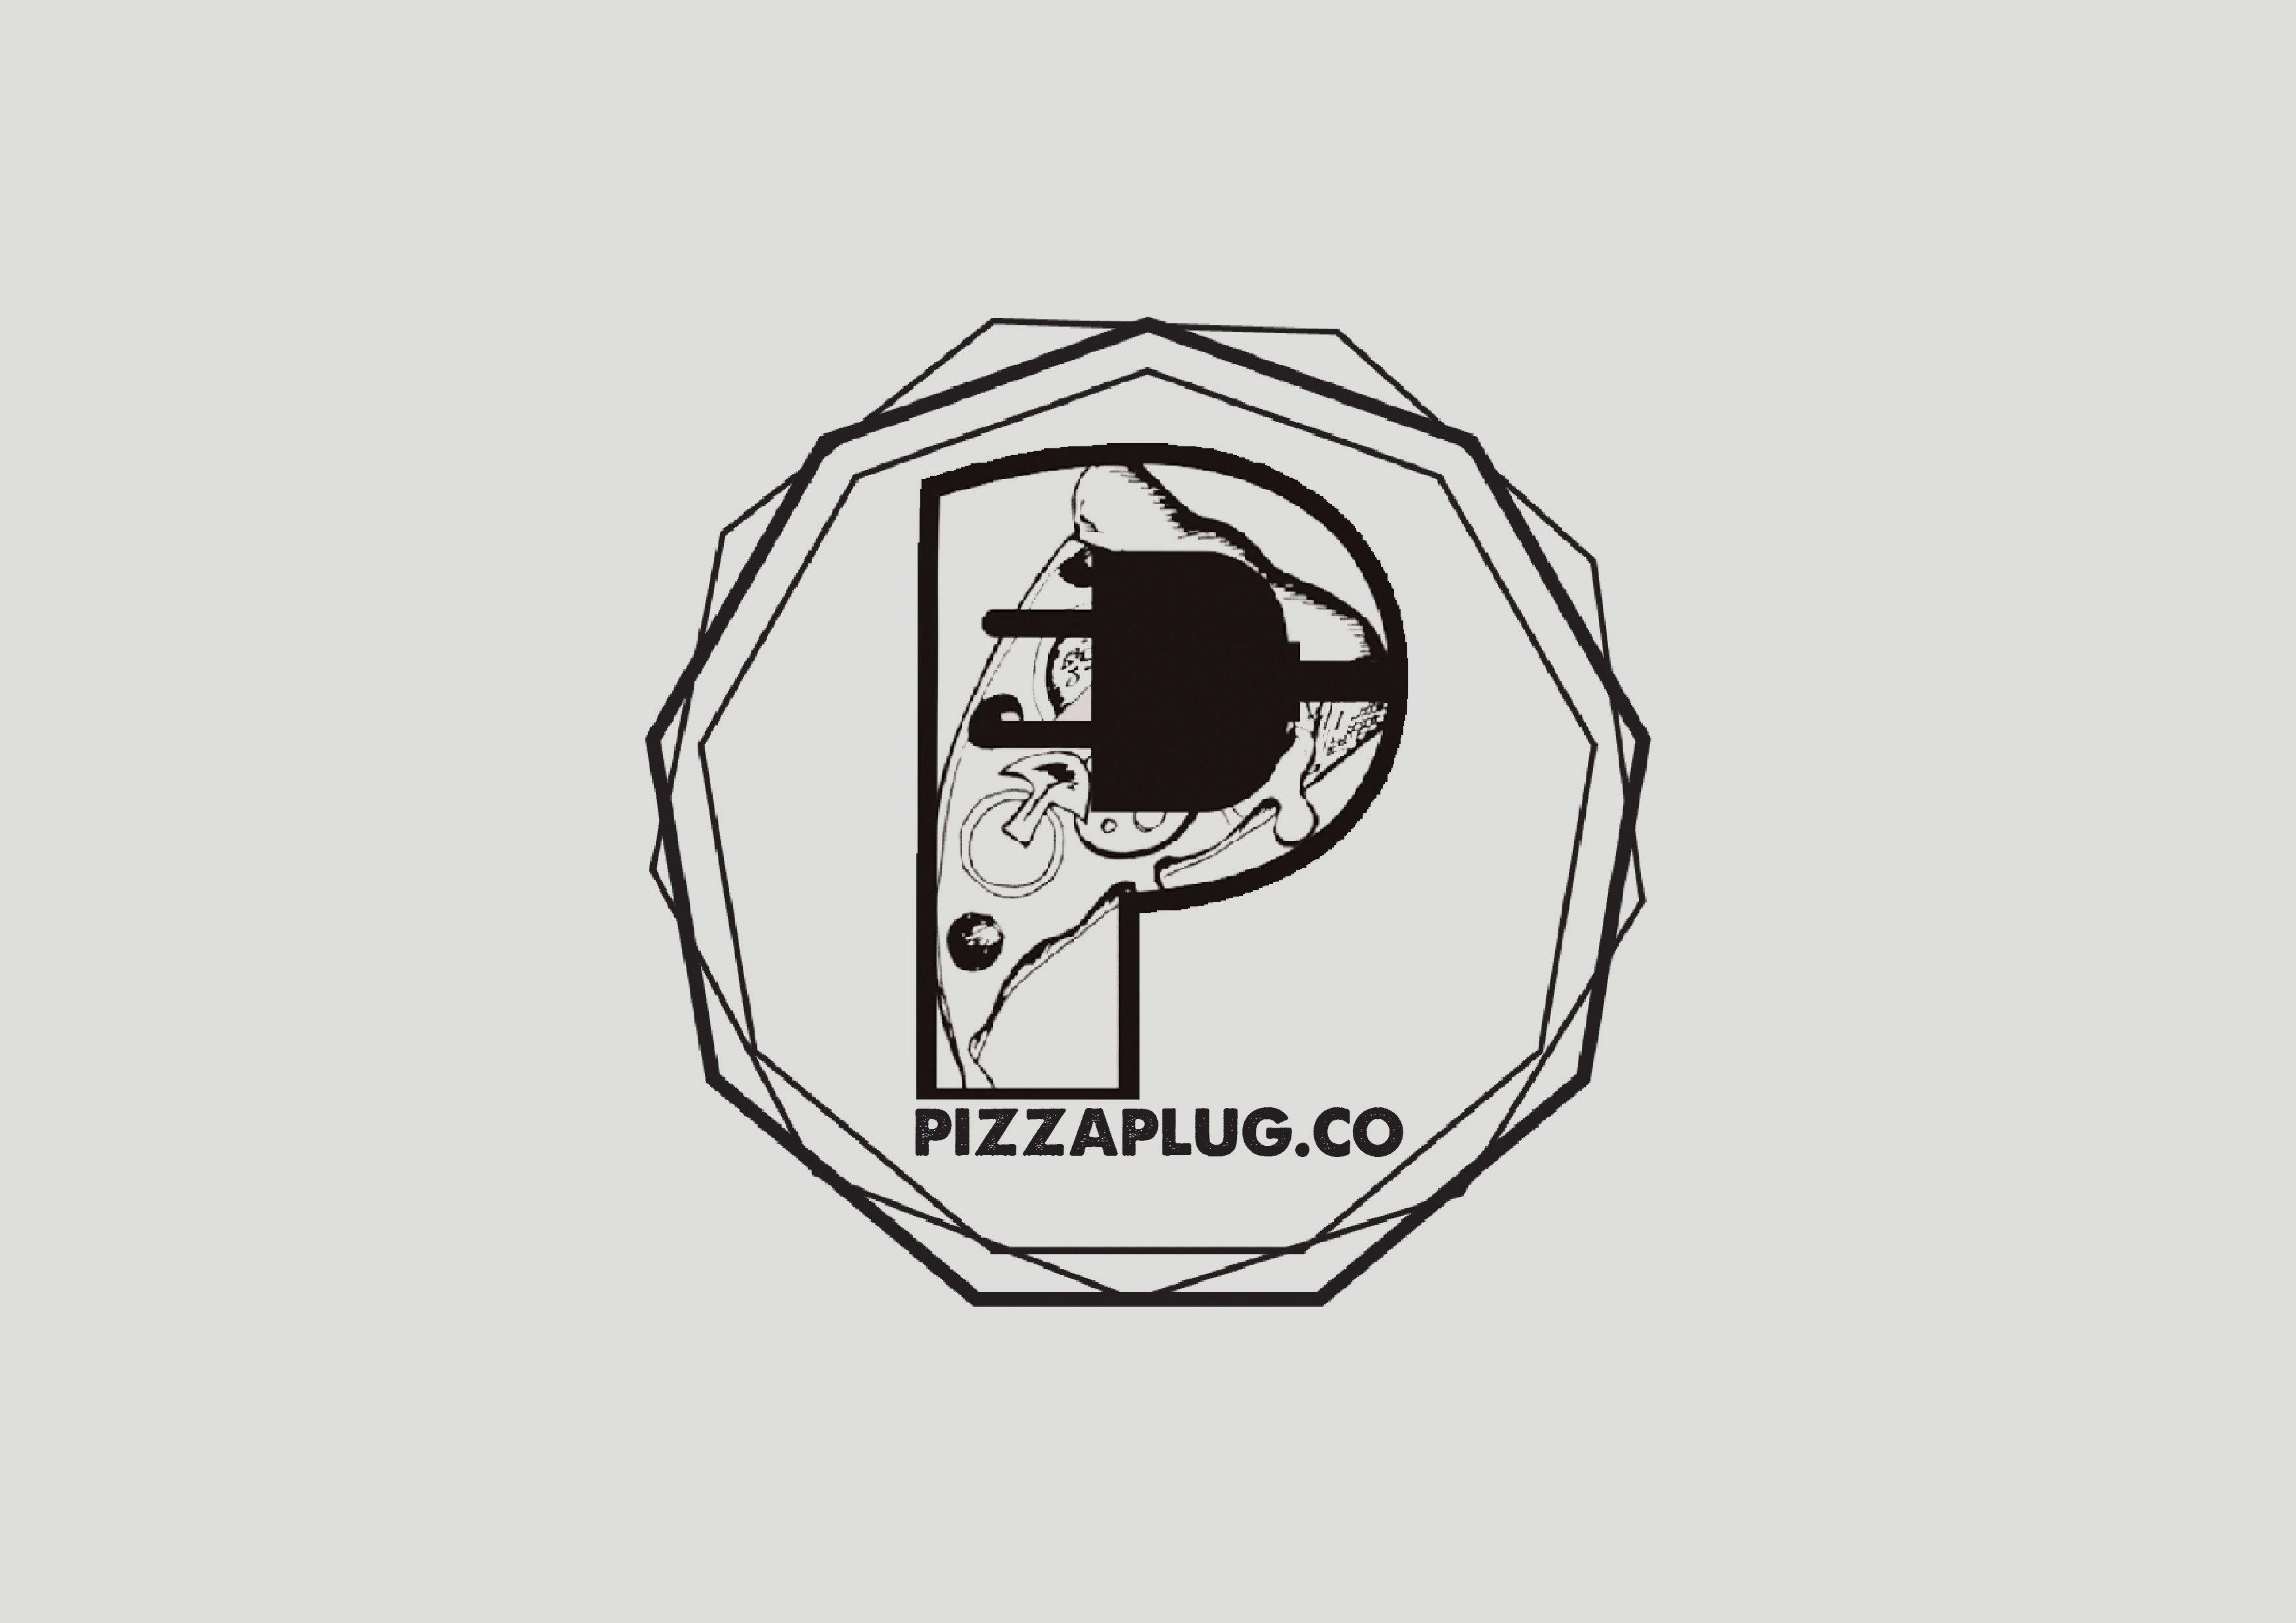 Pizzaplug.co